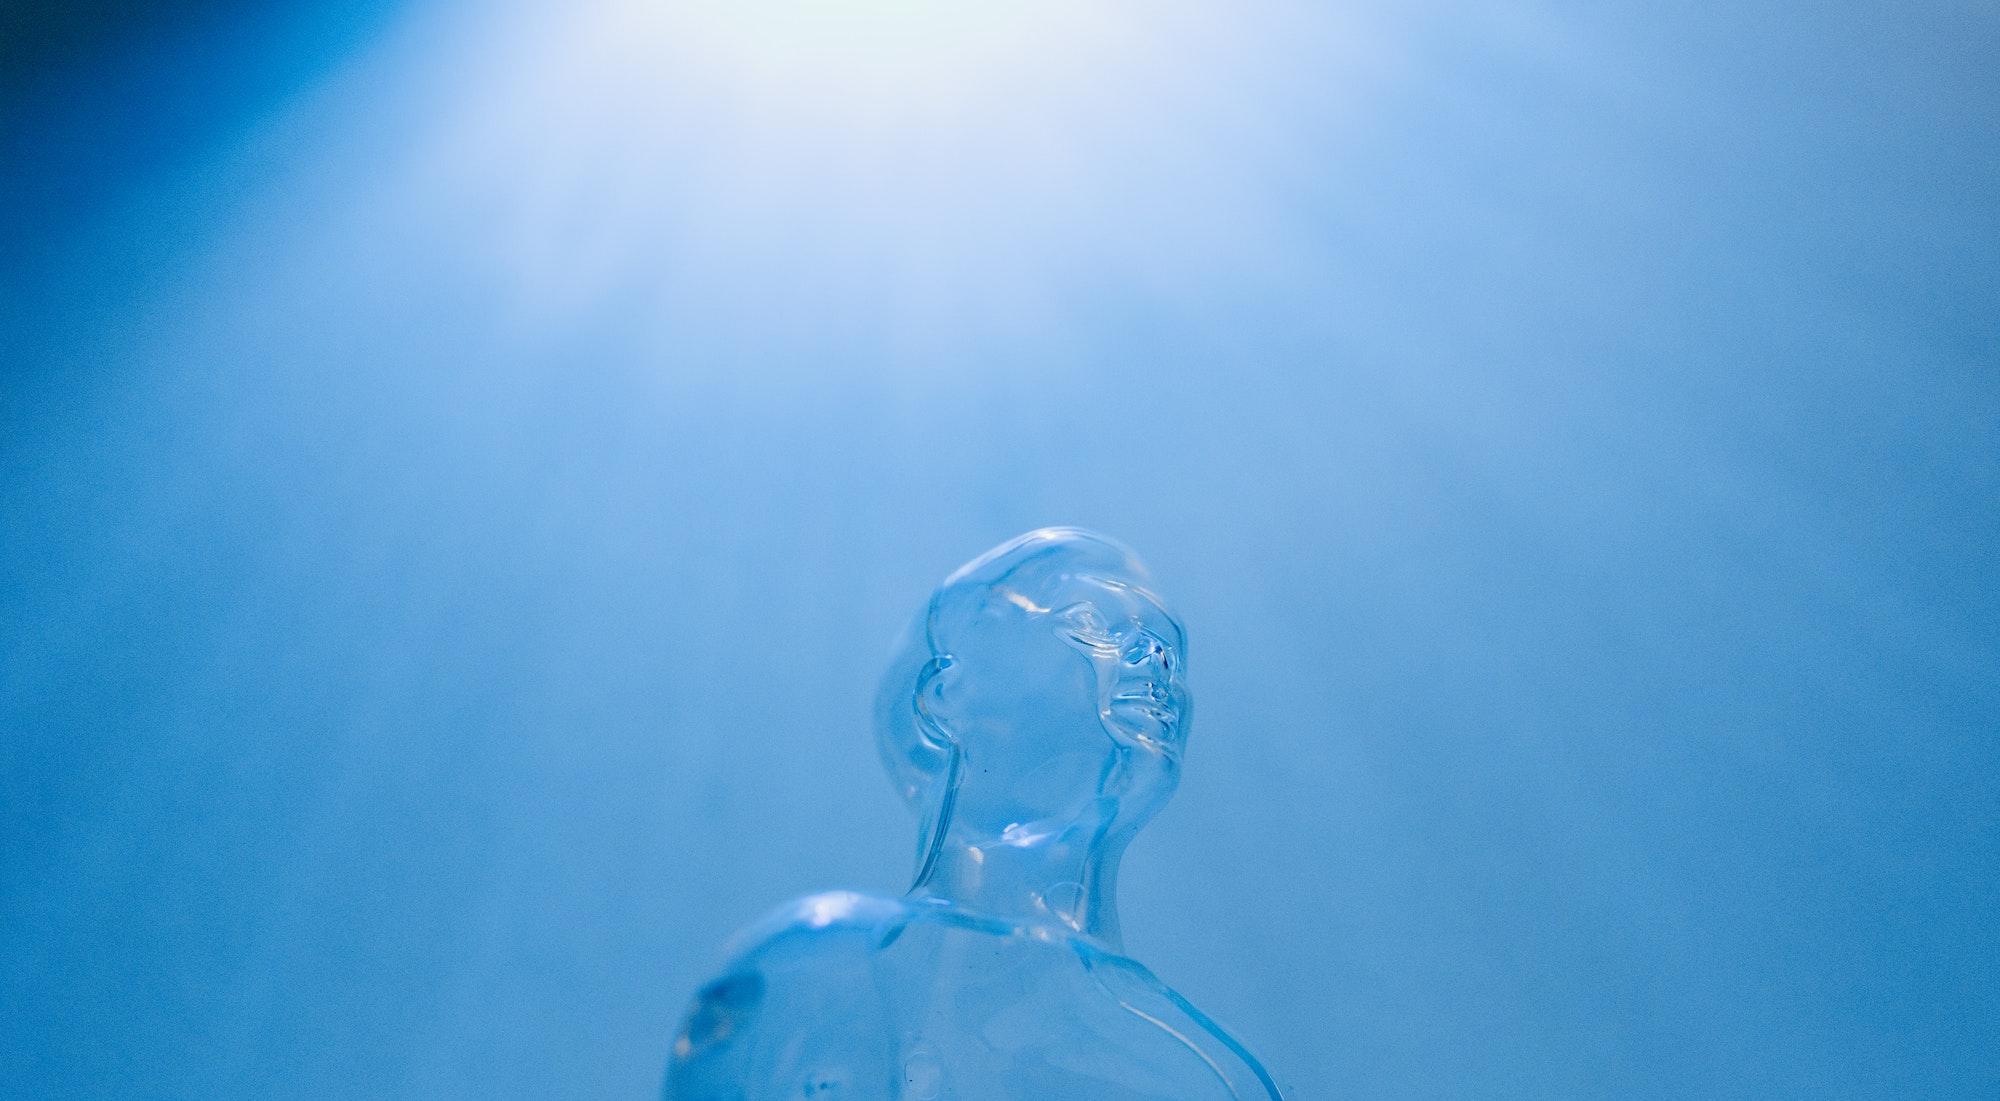 Plastic Bottle Under Water